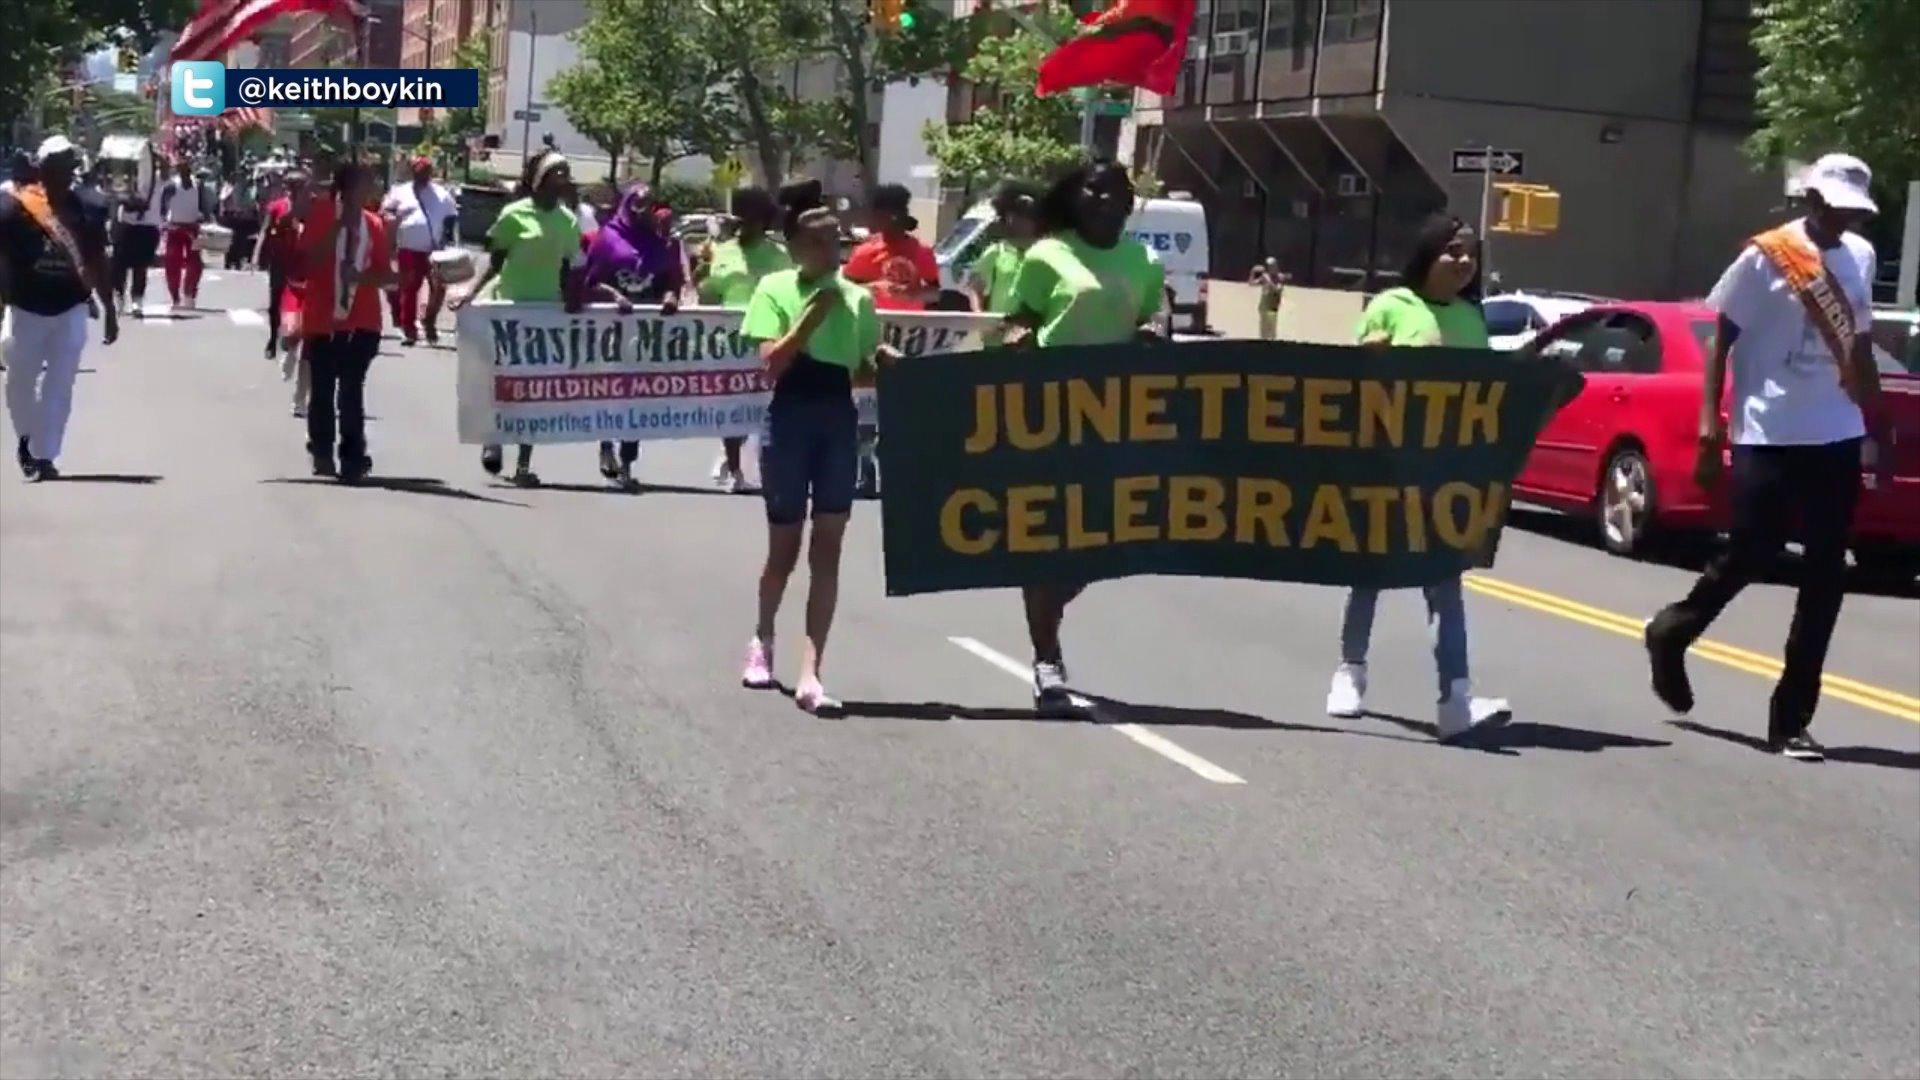 Juneteenth celebration